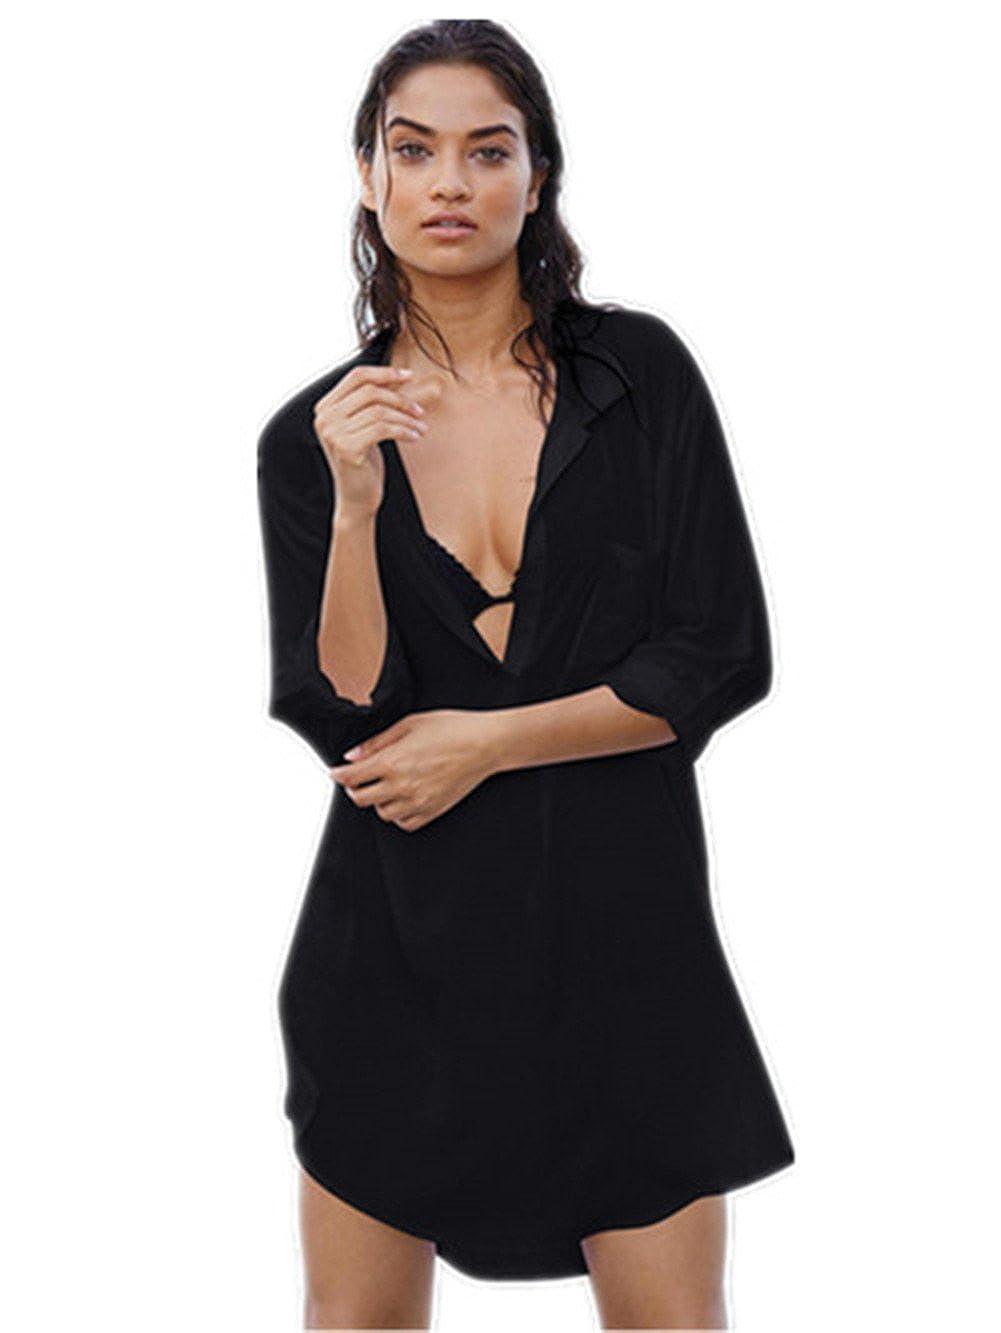 Black SUZALA Women Bikini Cover up Cotton Beach Shirt Dress Swimsuit Bathing Suit